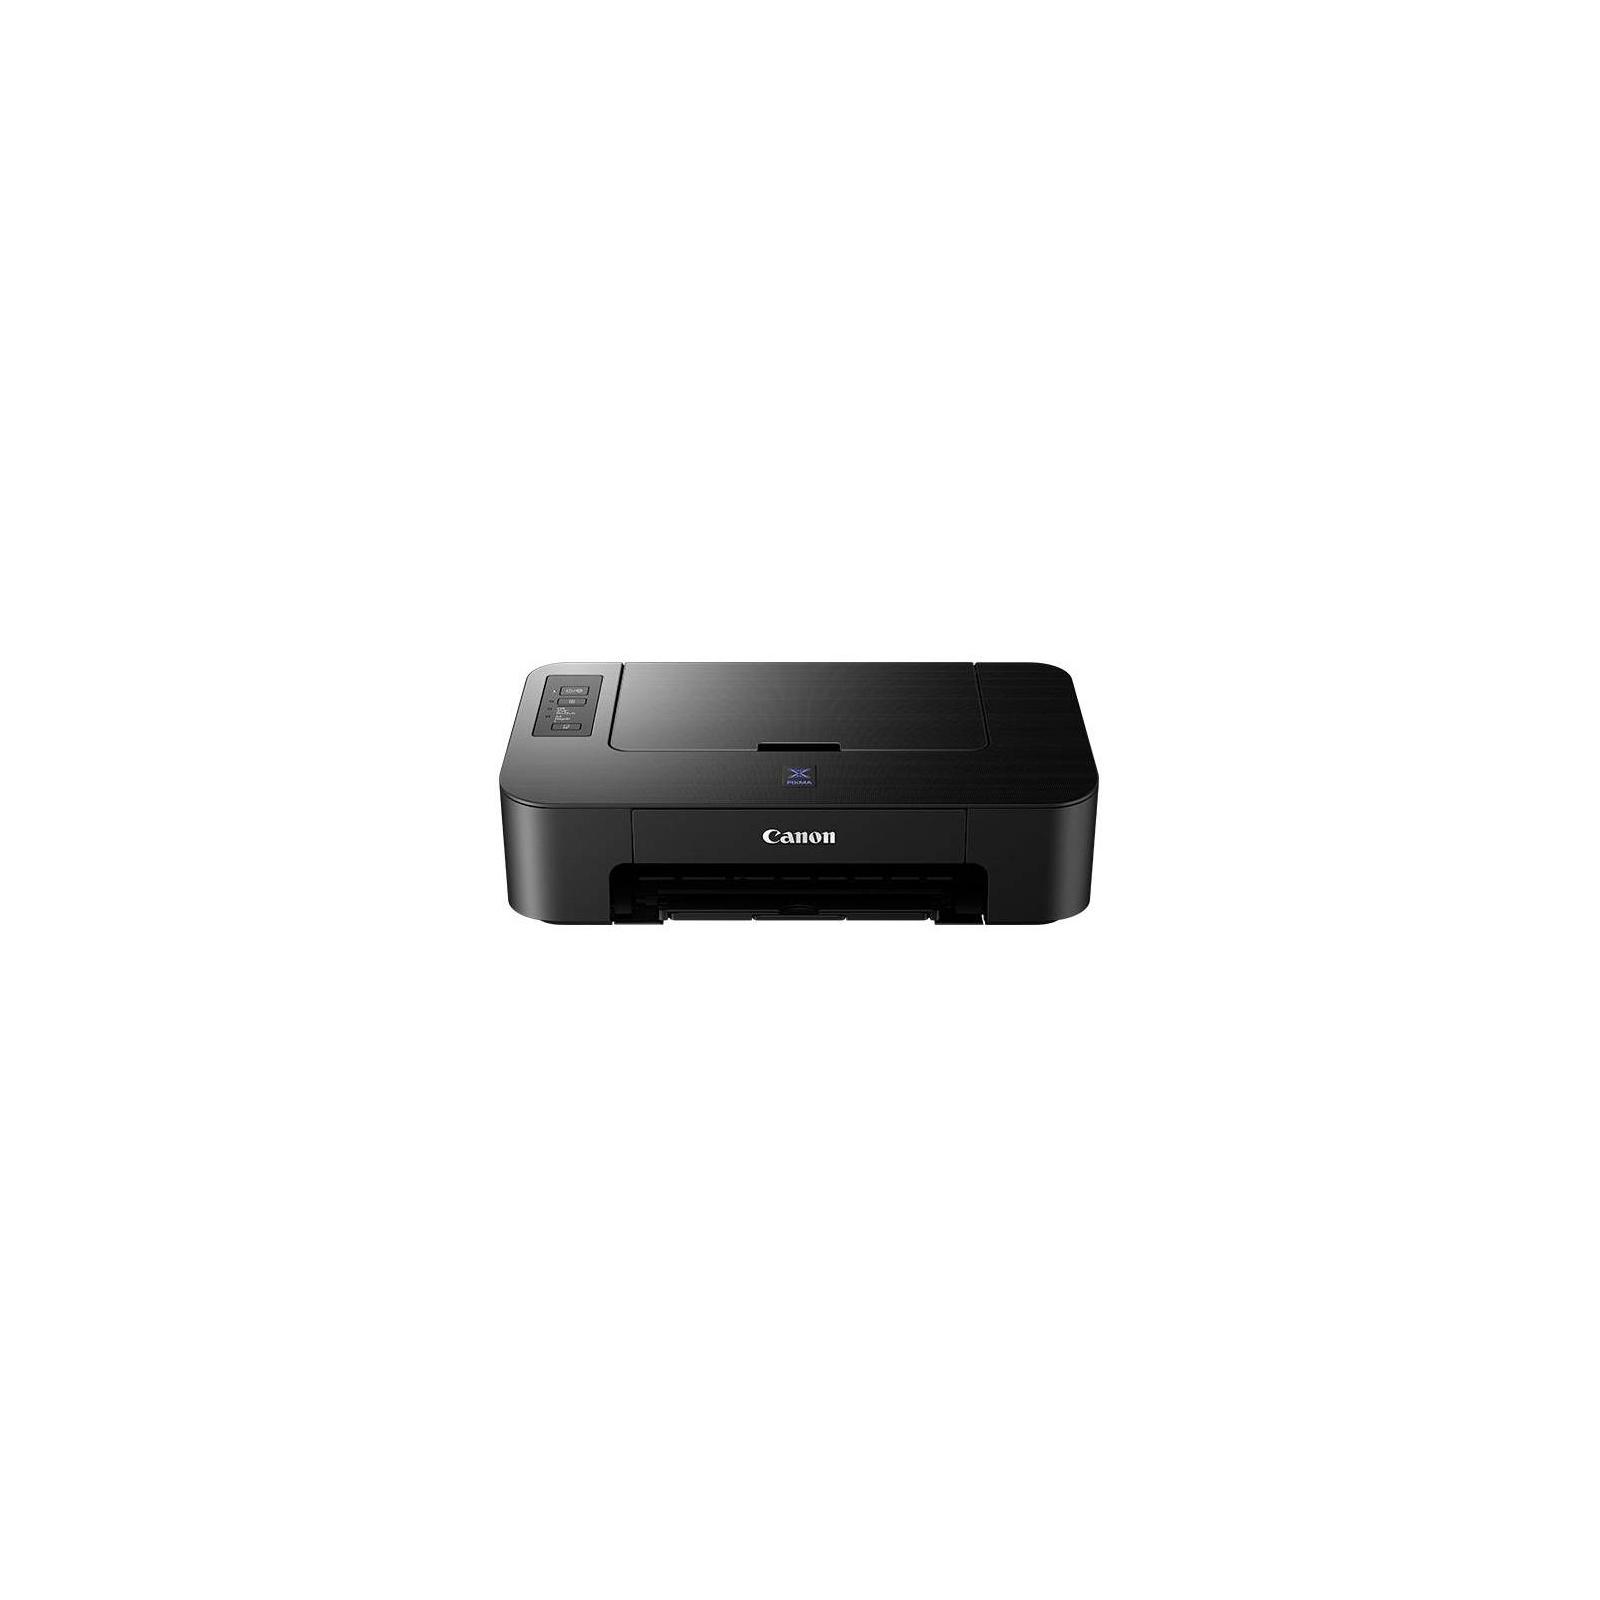 Струменевий принтер Canon PIXMA E204 (2320C009) зображення 2